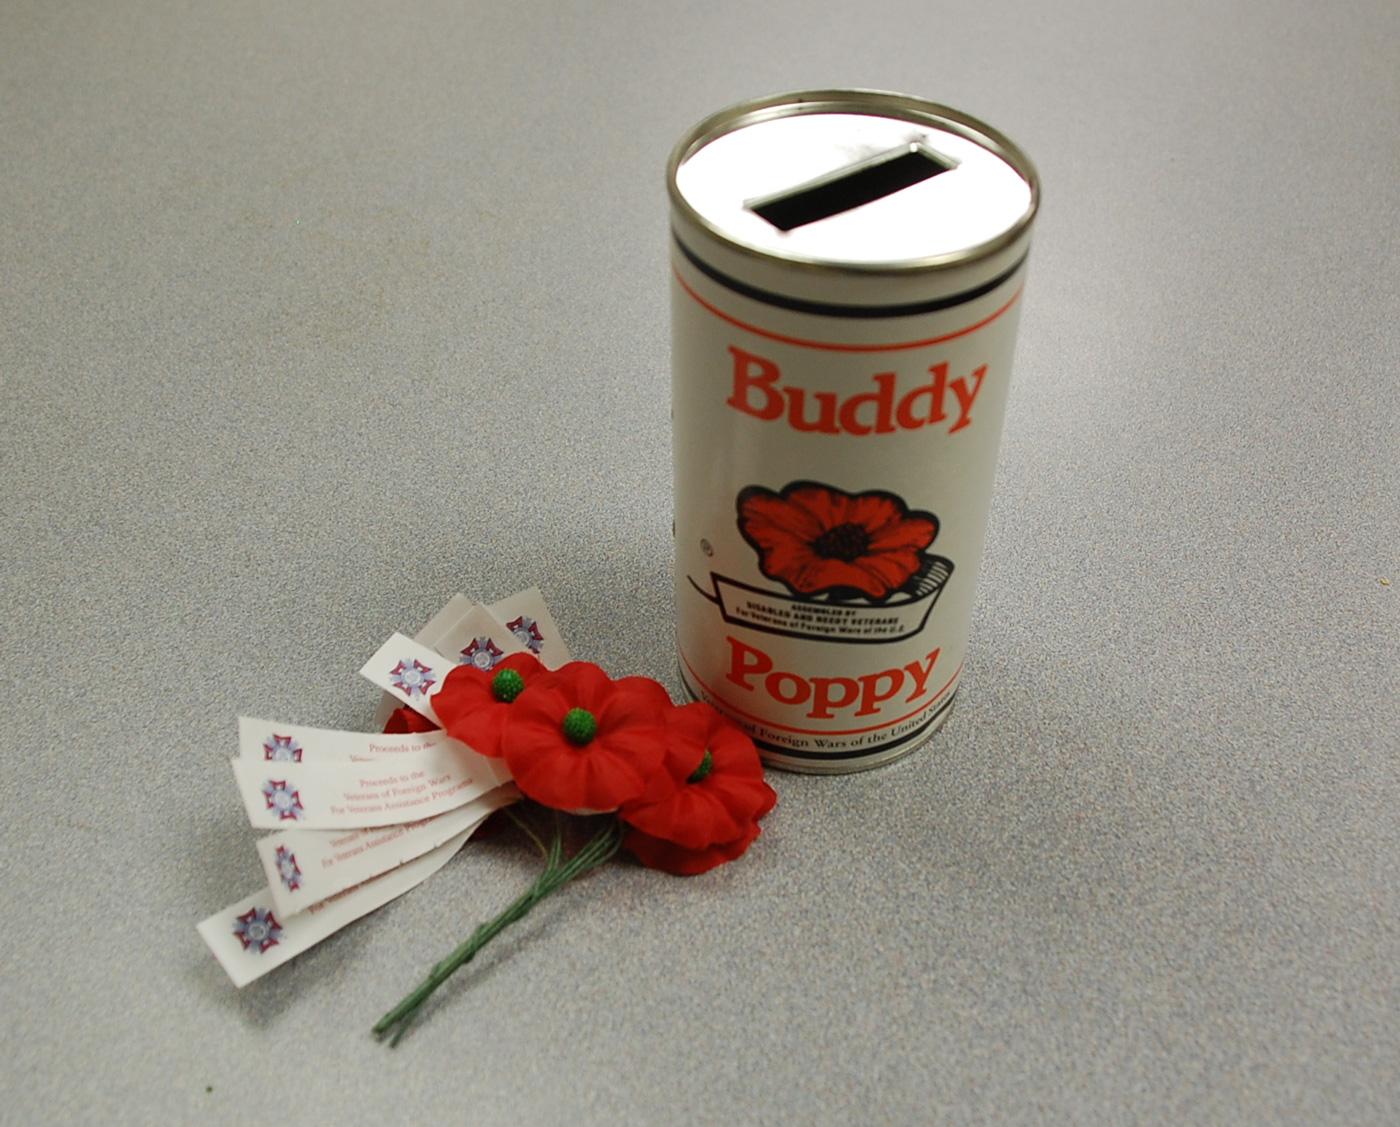 buddy-poppyDSC_5470